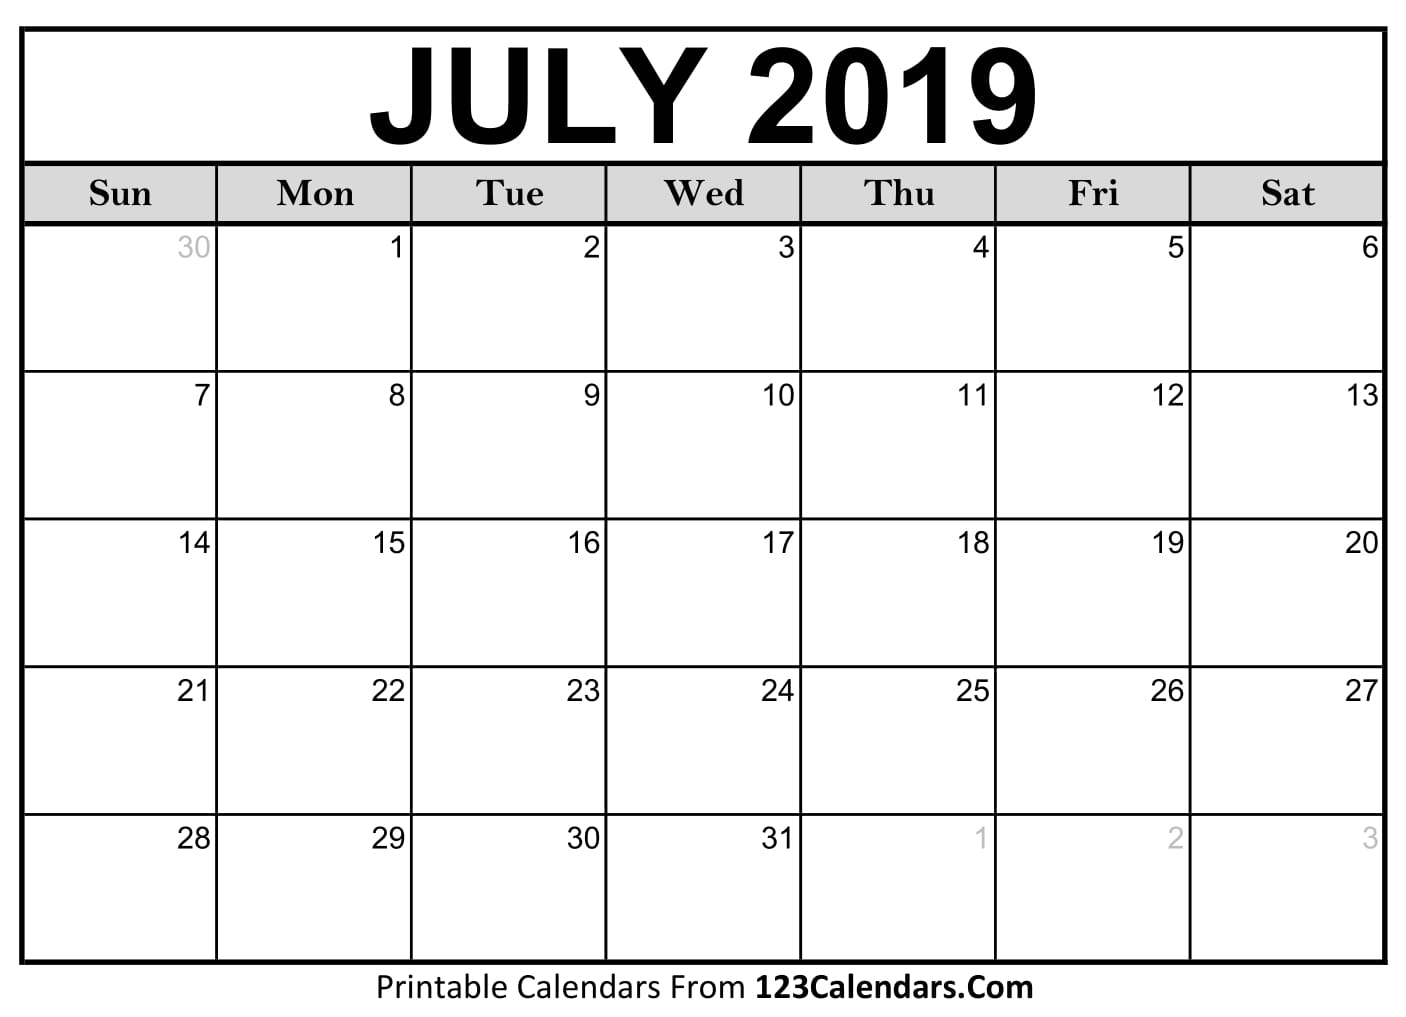 July 2019 Calendar Printable July 2019 Printable Calendar | 123Calendars.com